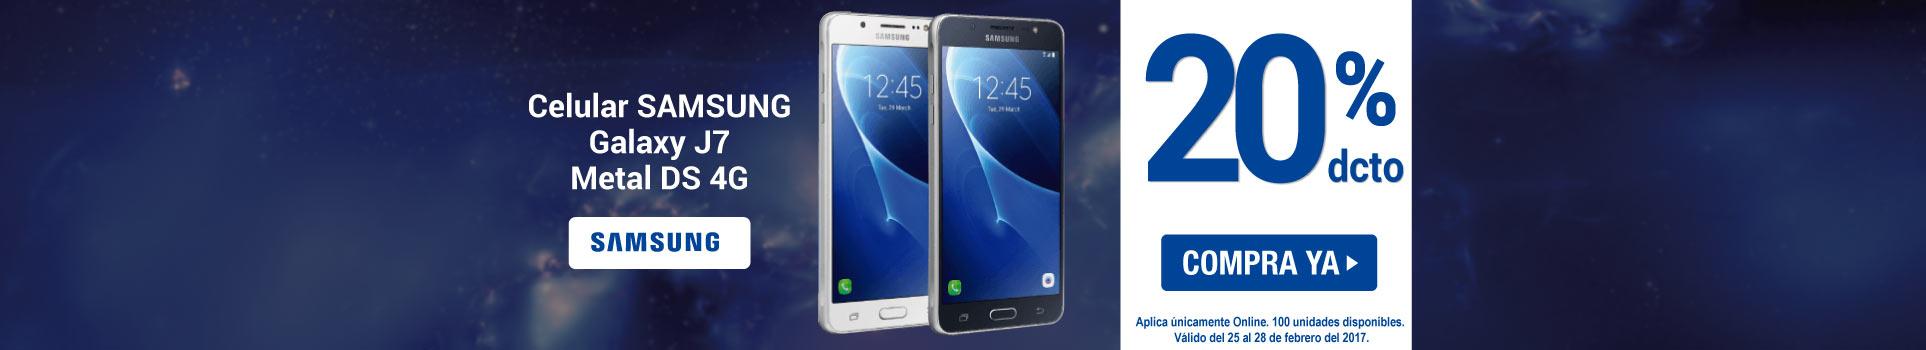 Celular SAMSUNG Galaxy J7 Metal DS - banner principal